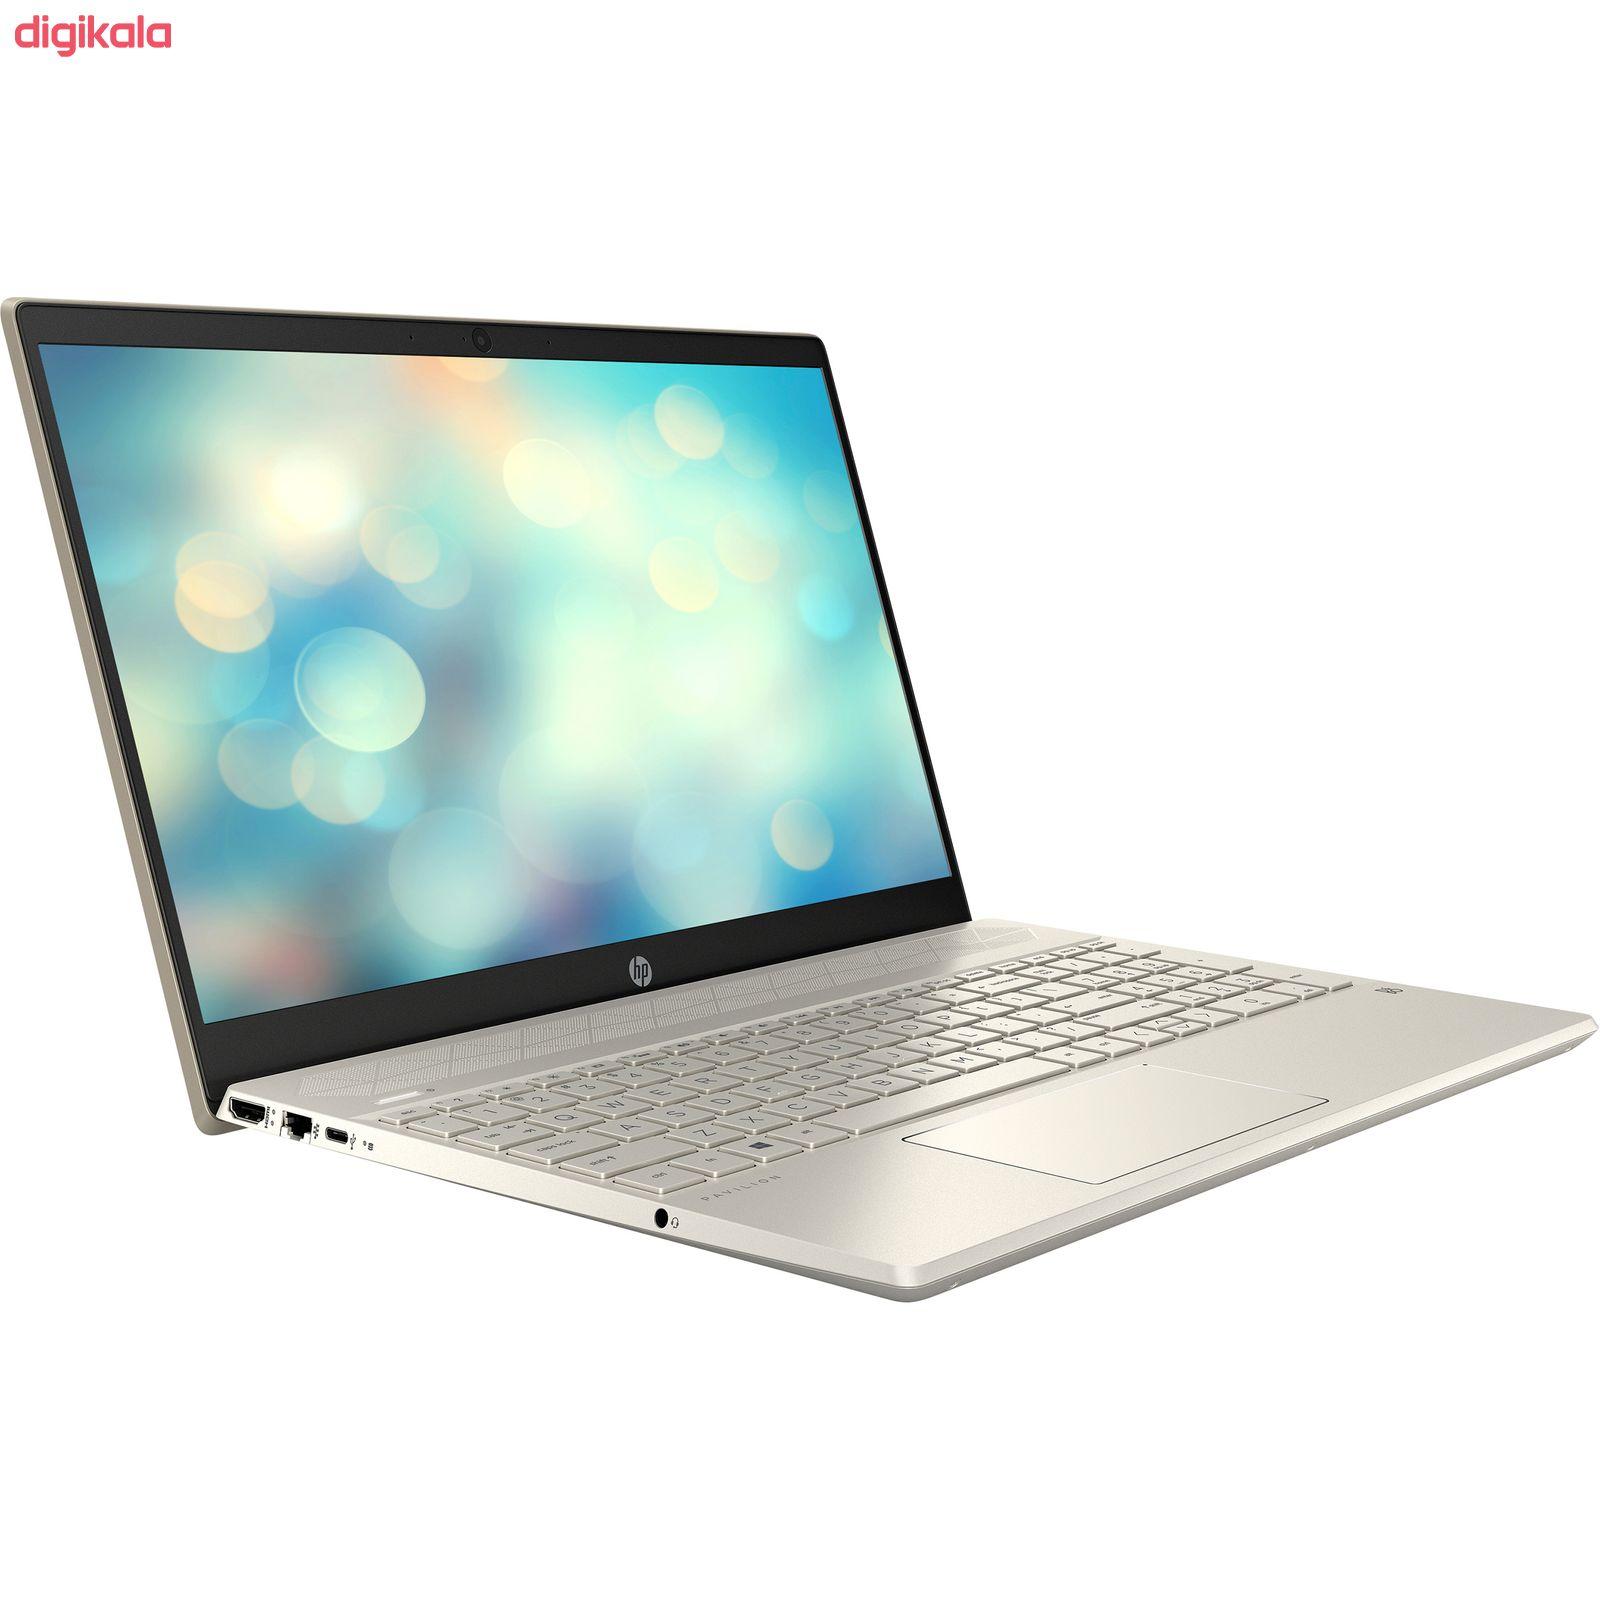 لپ تاپ 15.6 اینچی اچپی مدل Pavilion CS3458-A